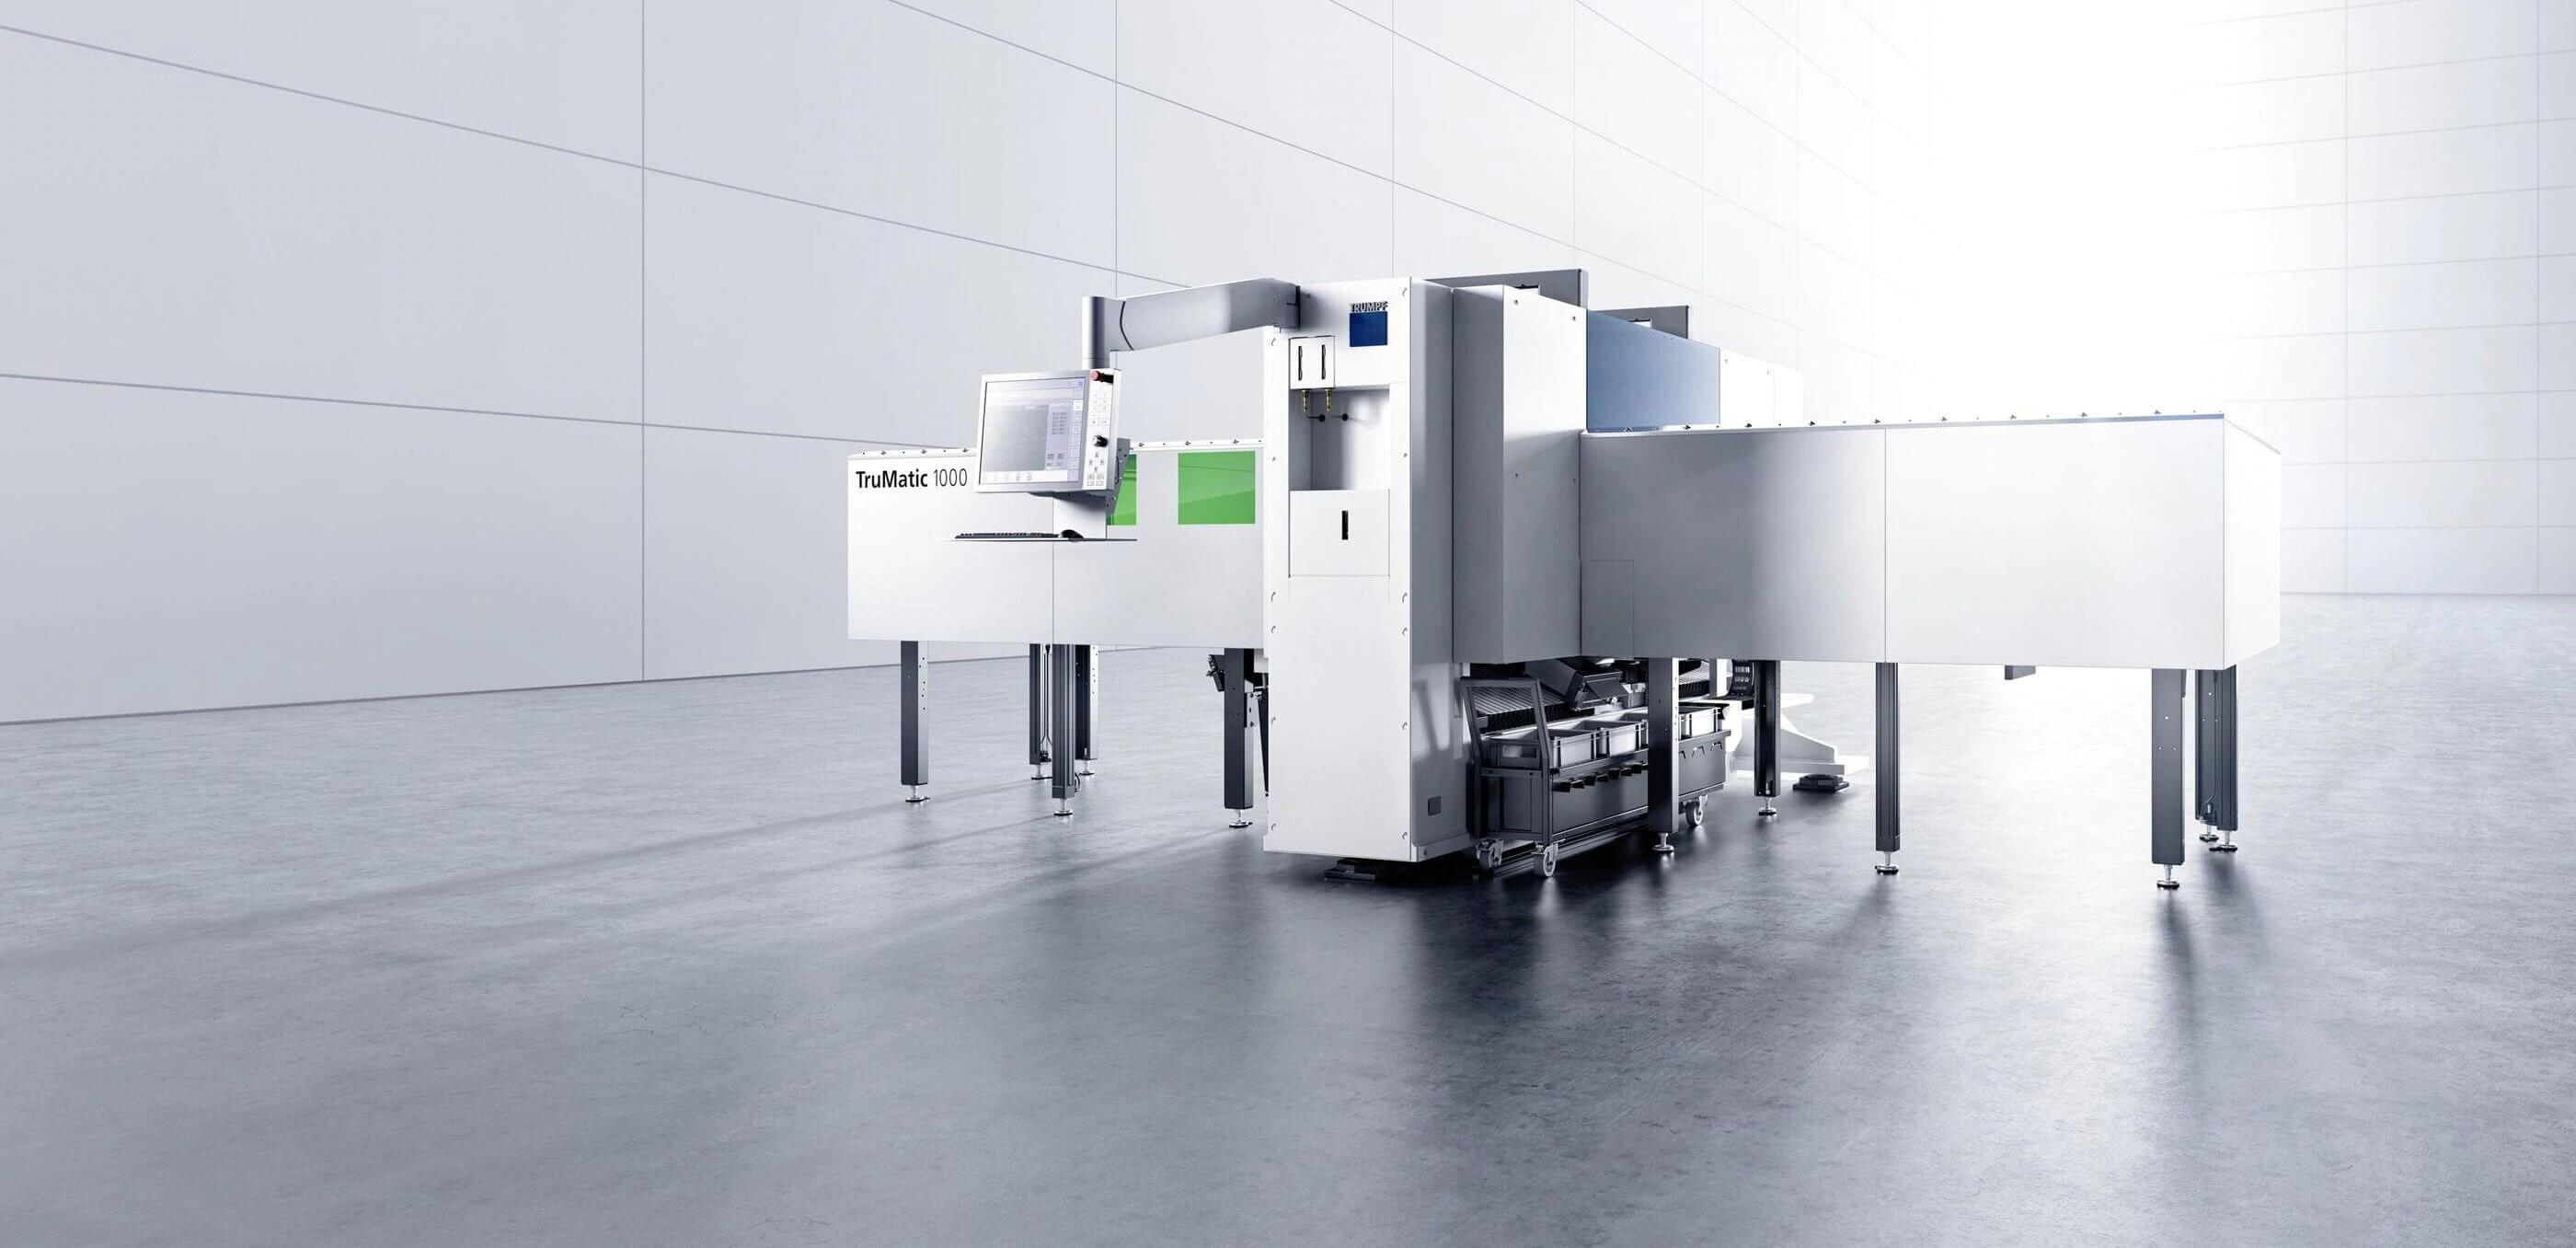 TruMatic 1000 fiber